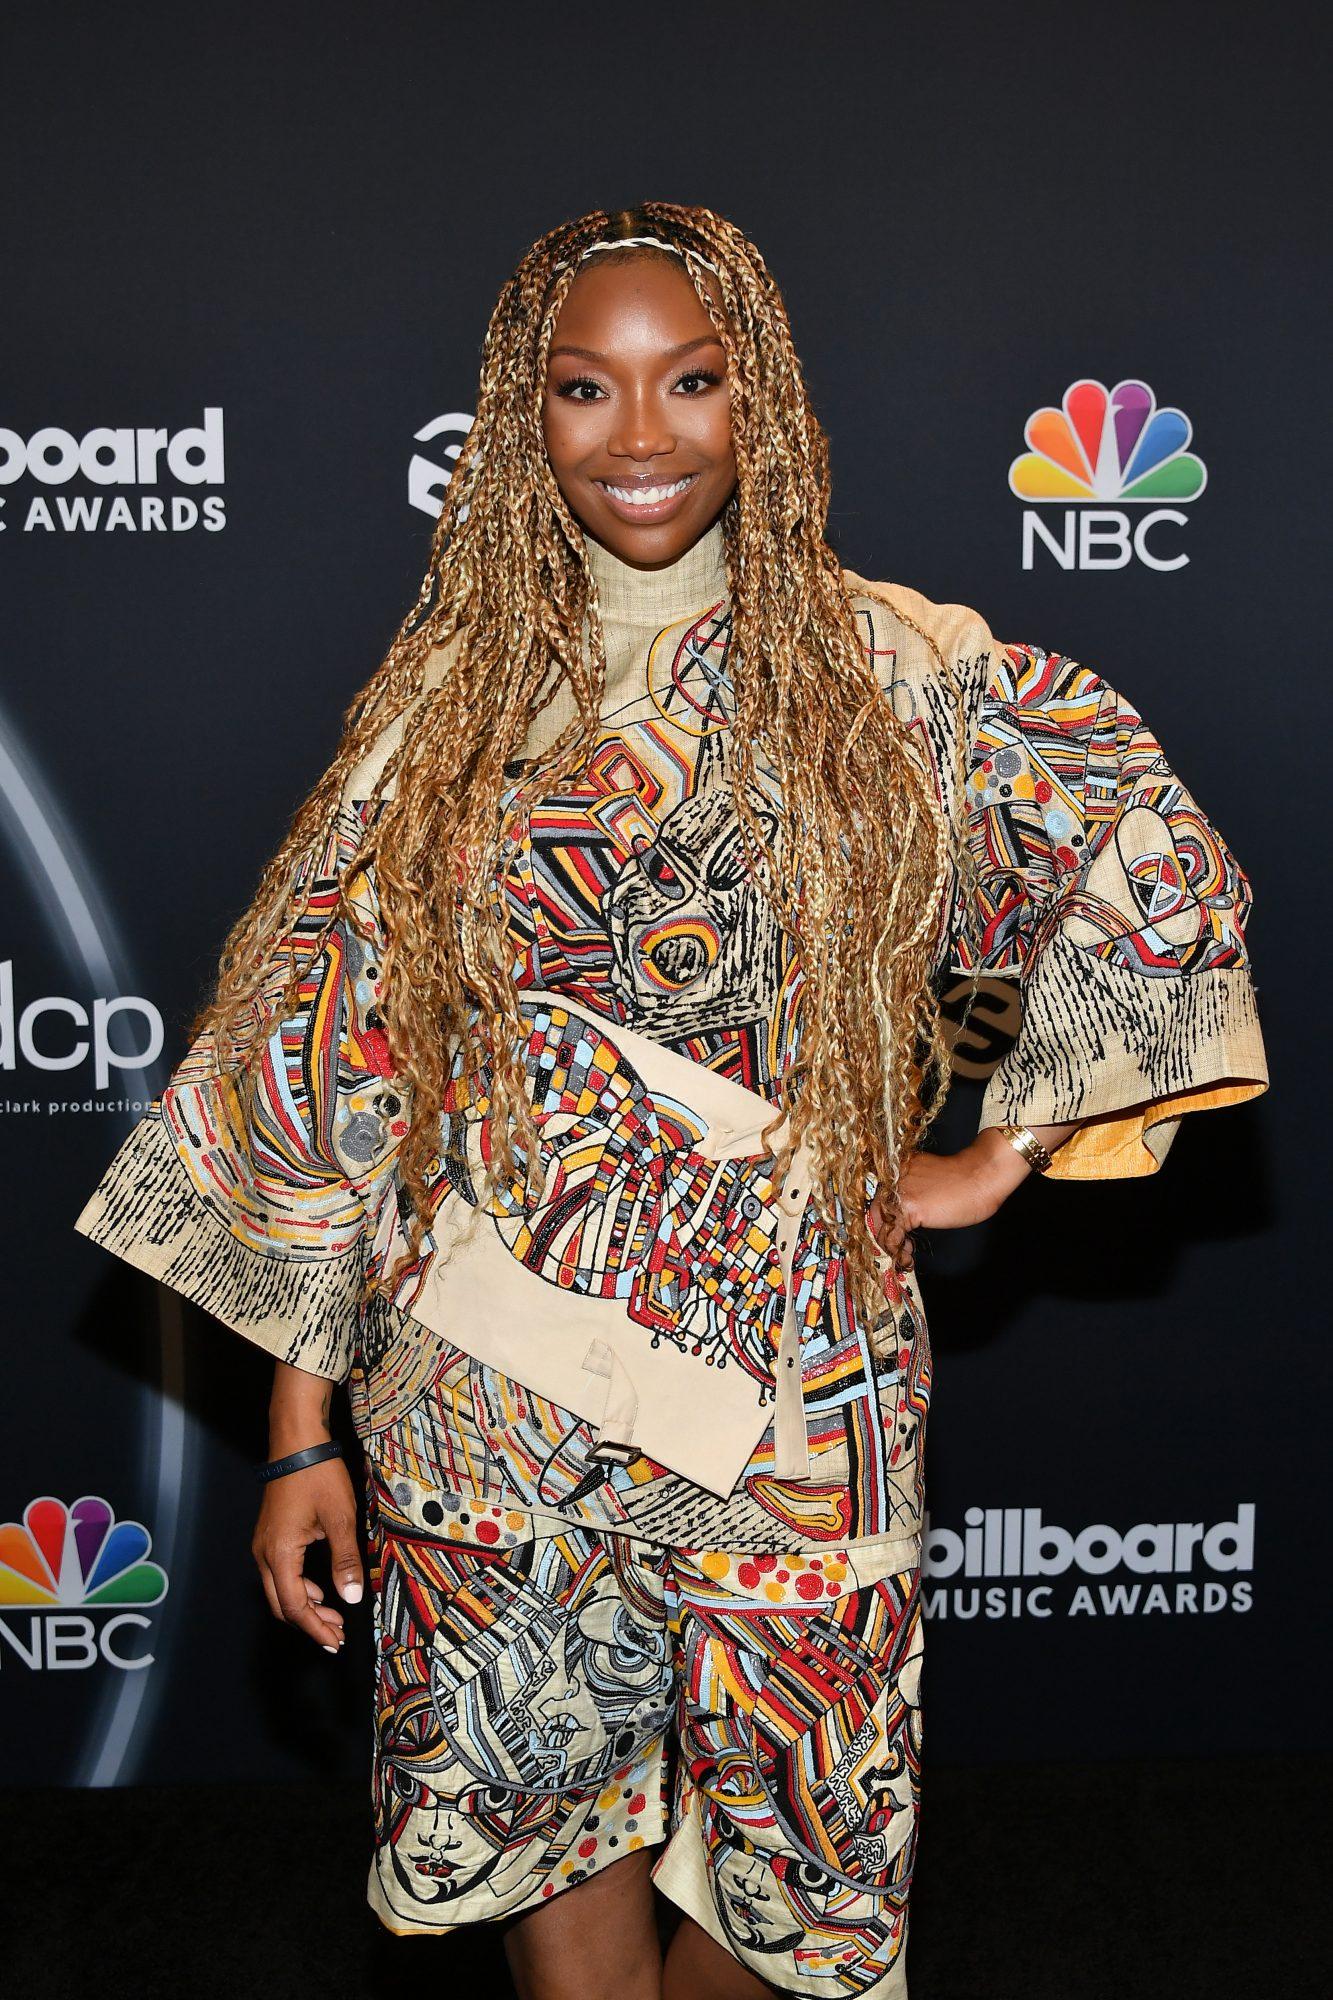 brandy 2020 billboard music awards red carpet